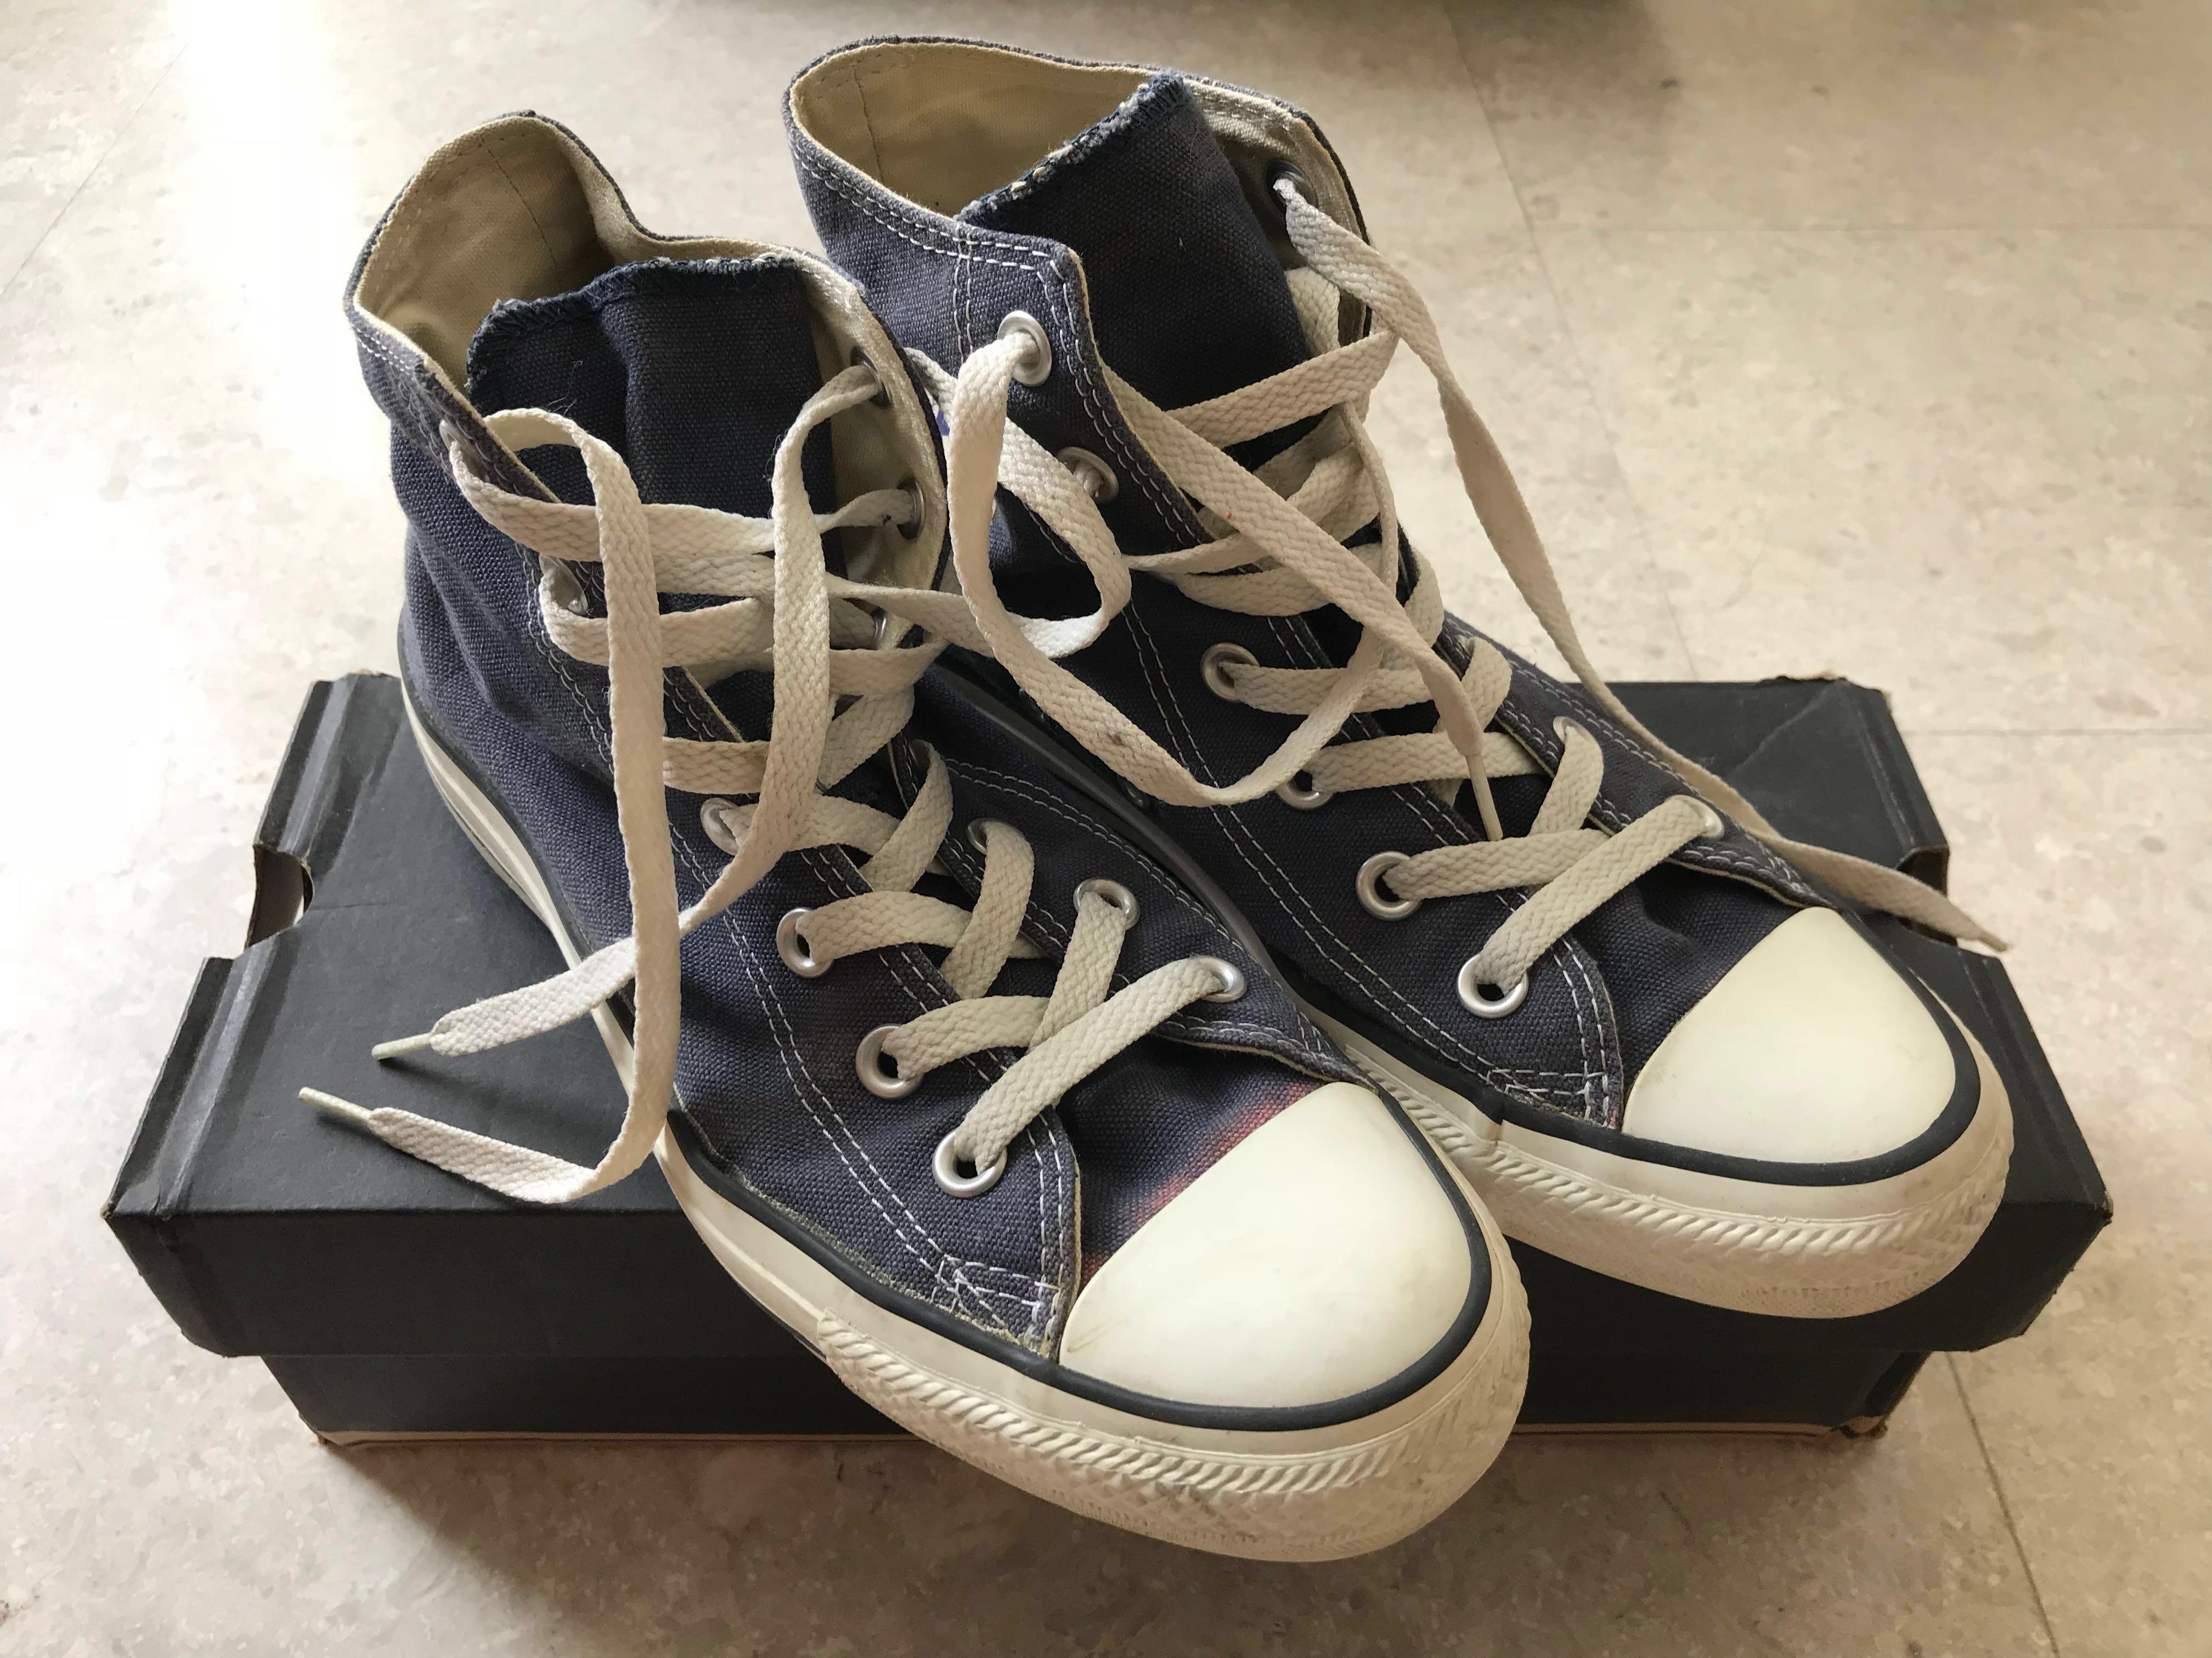 c2e47efa0caa Home · Women s Fashion · Shoes · Sneakers. photo photo photo photo